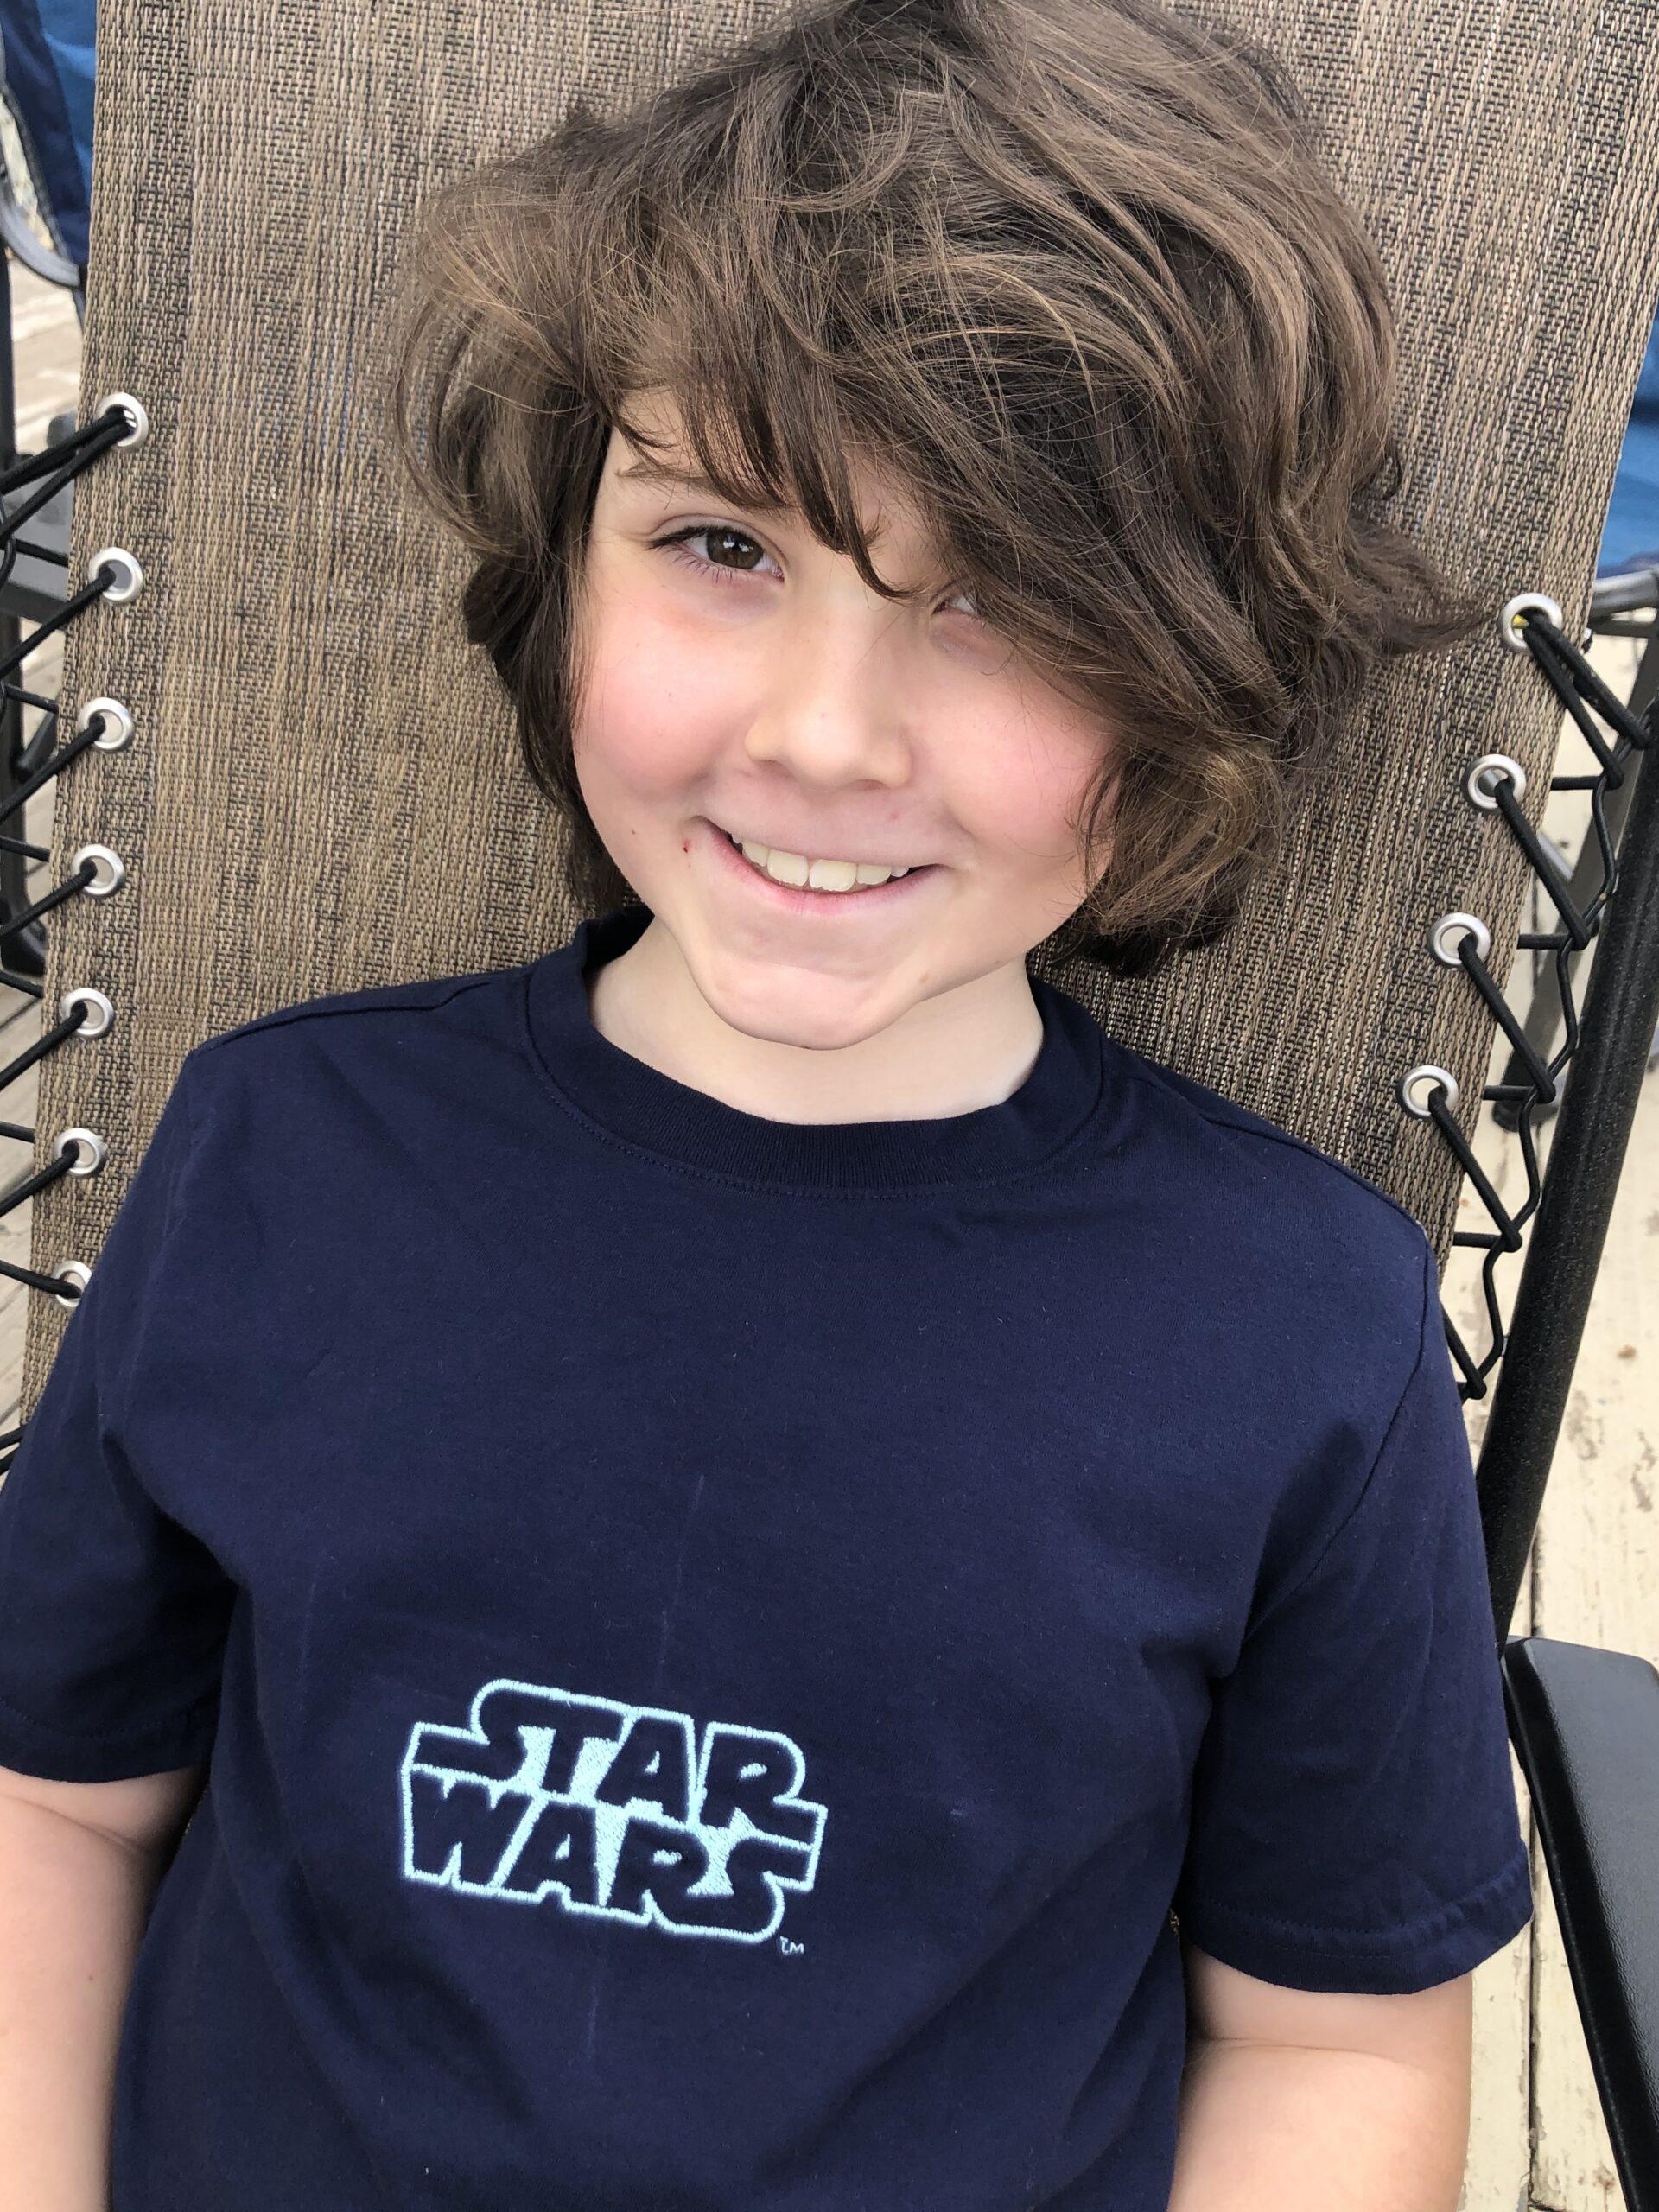 Star Wars finished T-shirt on model